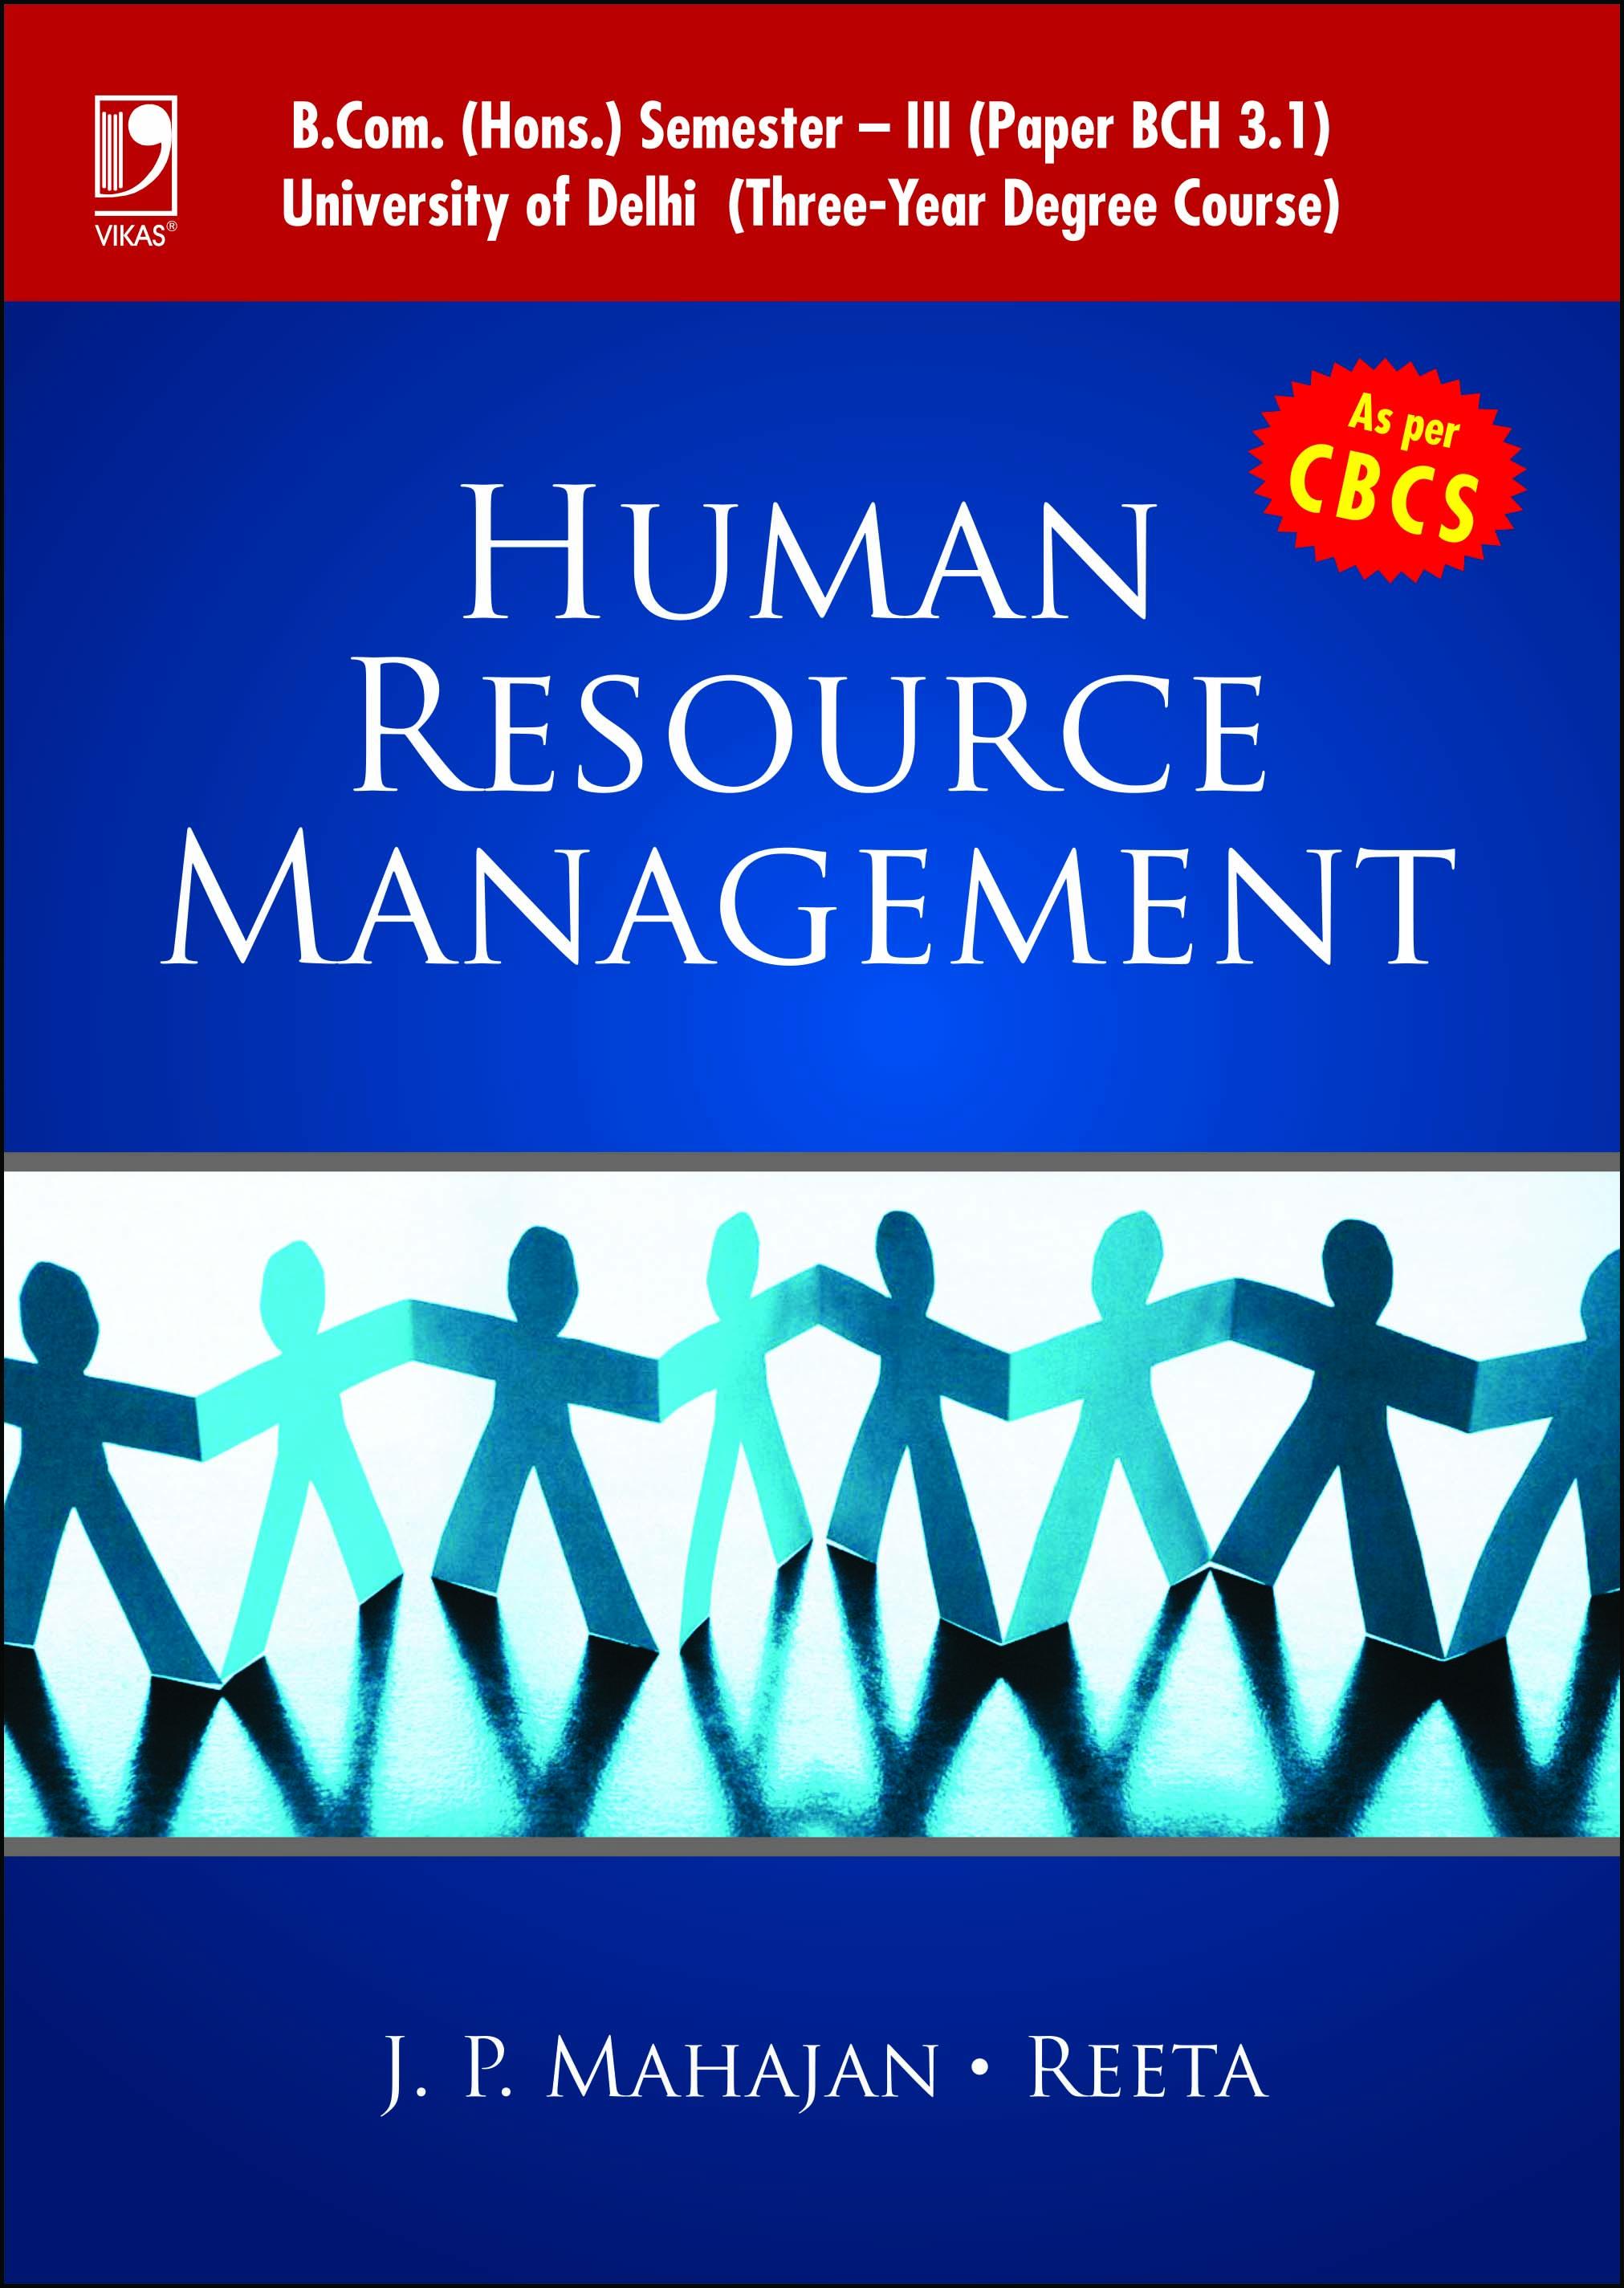 HUMAN RESOURCE MANAGEMENT: (FOR B.COM, SEM.-3, DELHI UNIVERSITY, AS PER CBCS) by  J P Mahajan